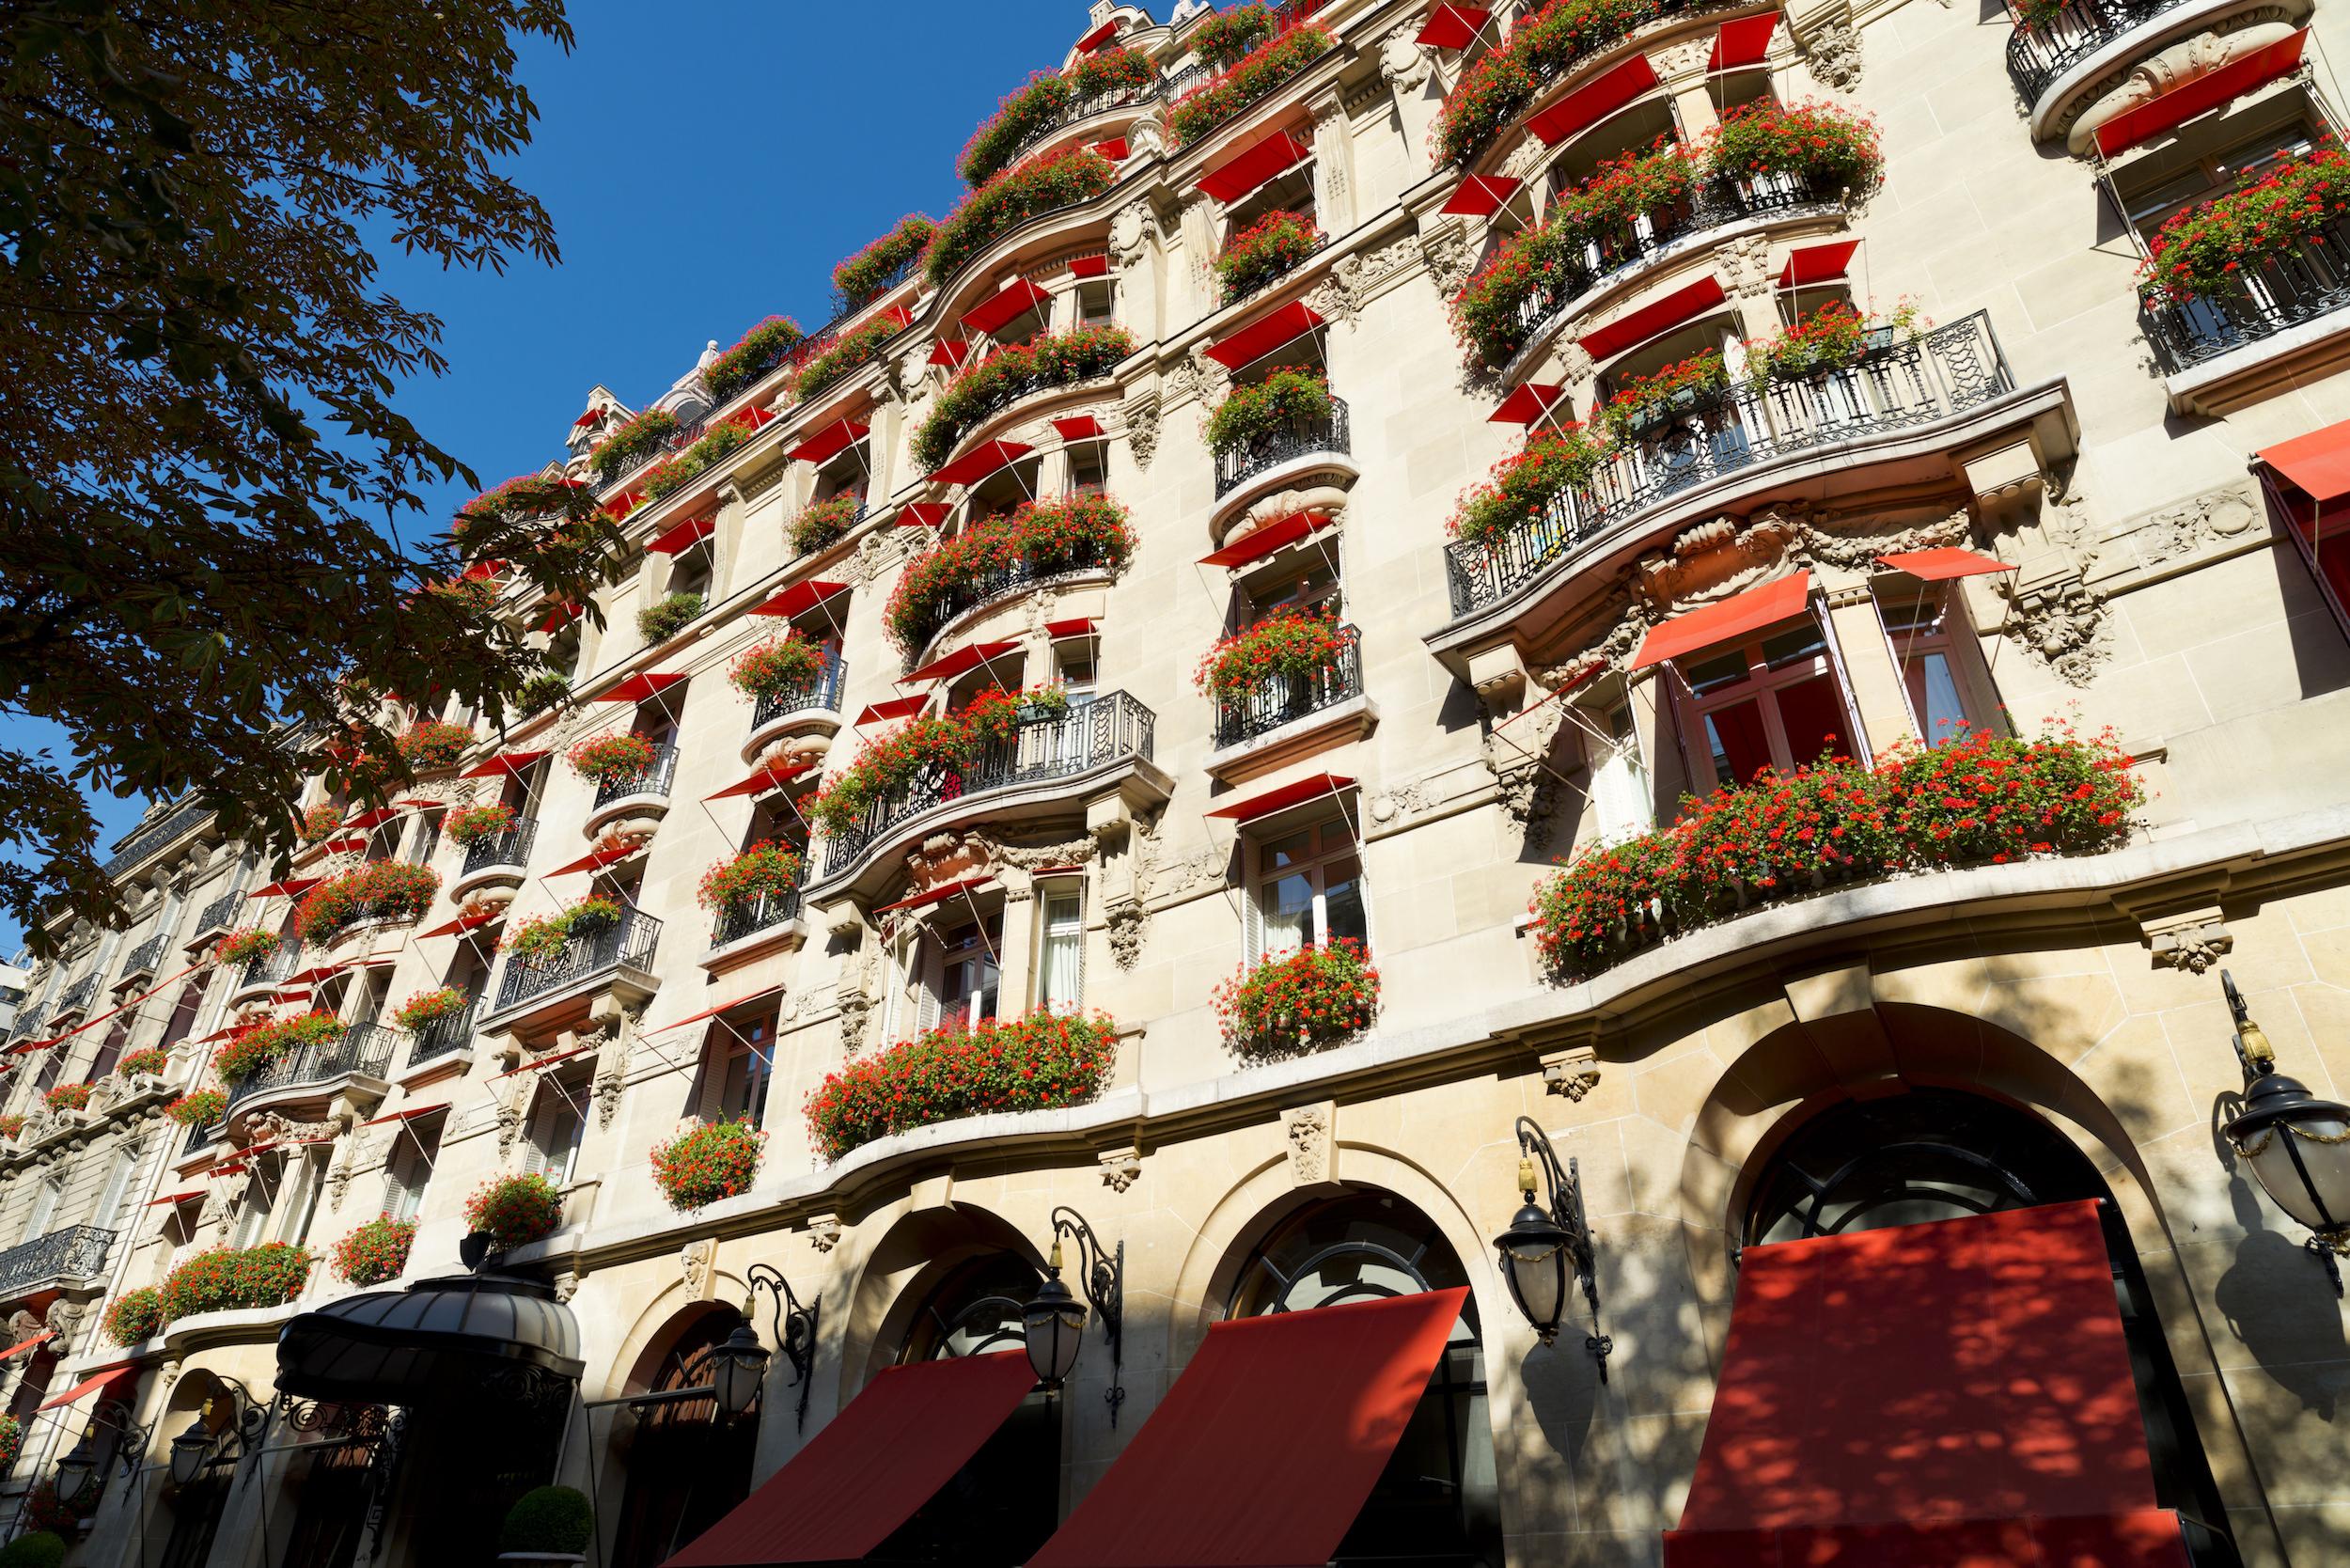 Hôtel Plaza Athénée Paris appearance